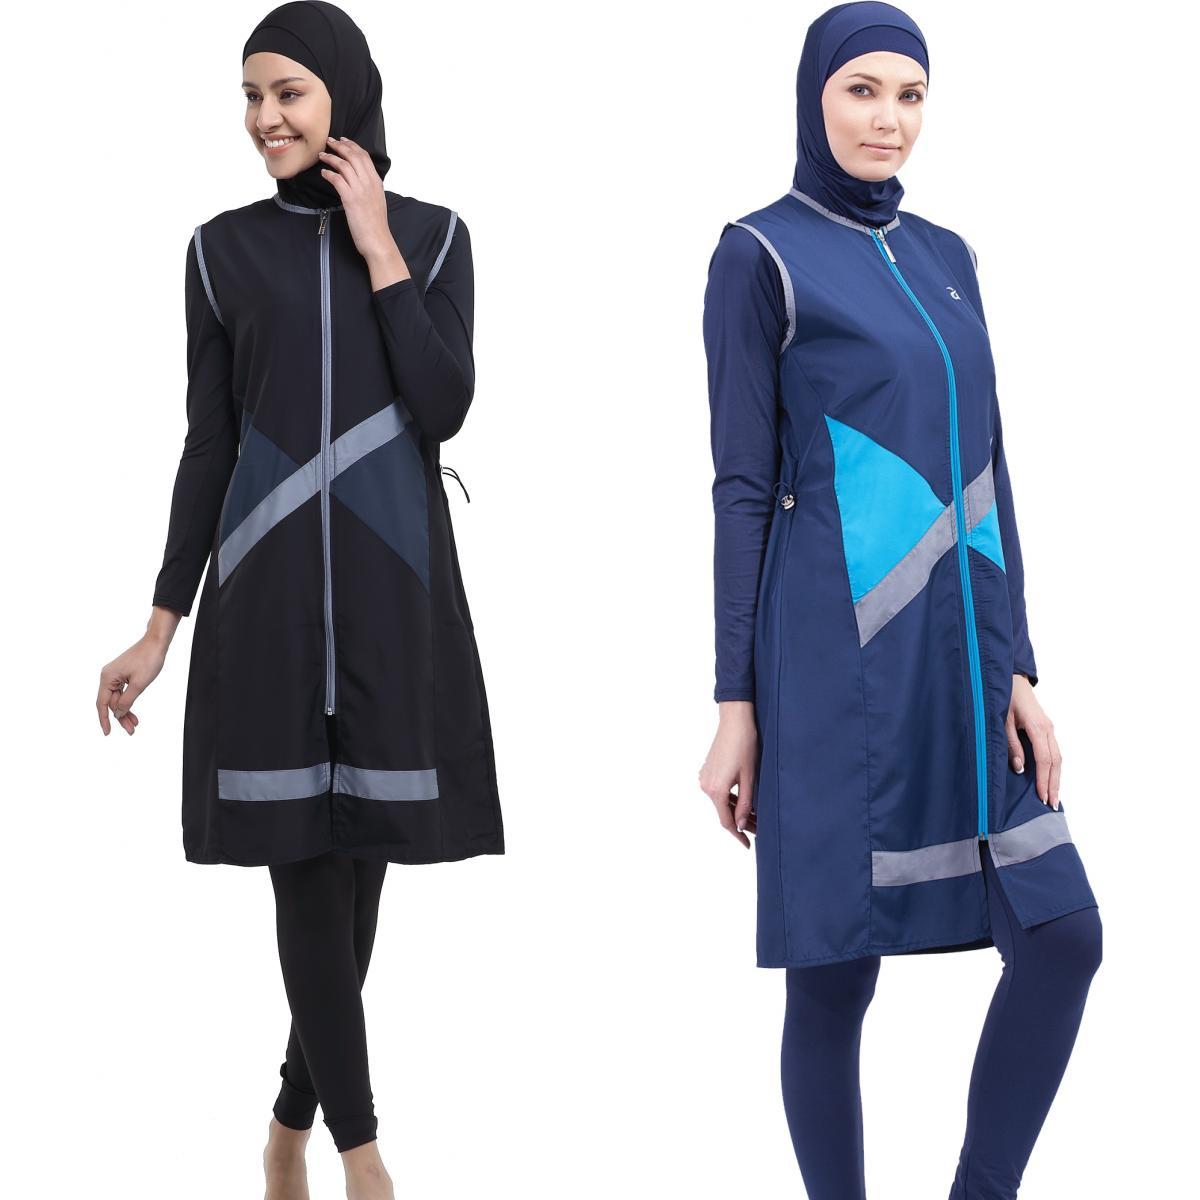 Argisa 7108 Garnili Jileli The Tights Long Hijab Swimwear S-5XL Plus Size Muslim Hijab Islamic Swimsuit Swim Burkinis Full Cover